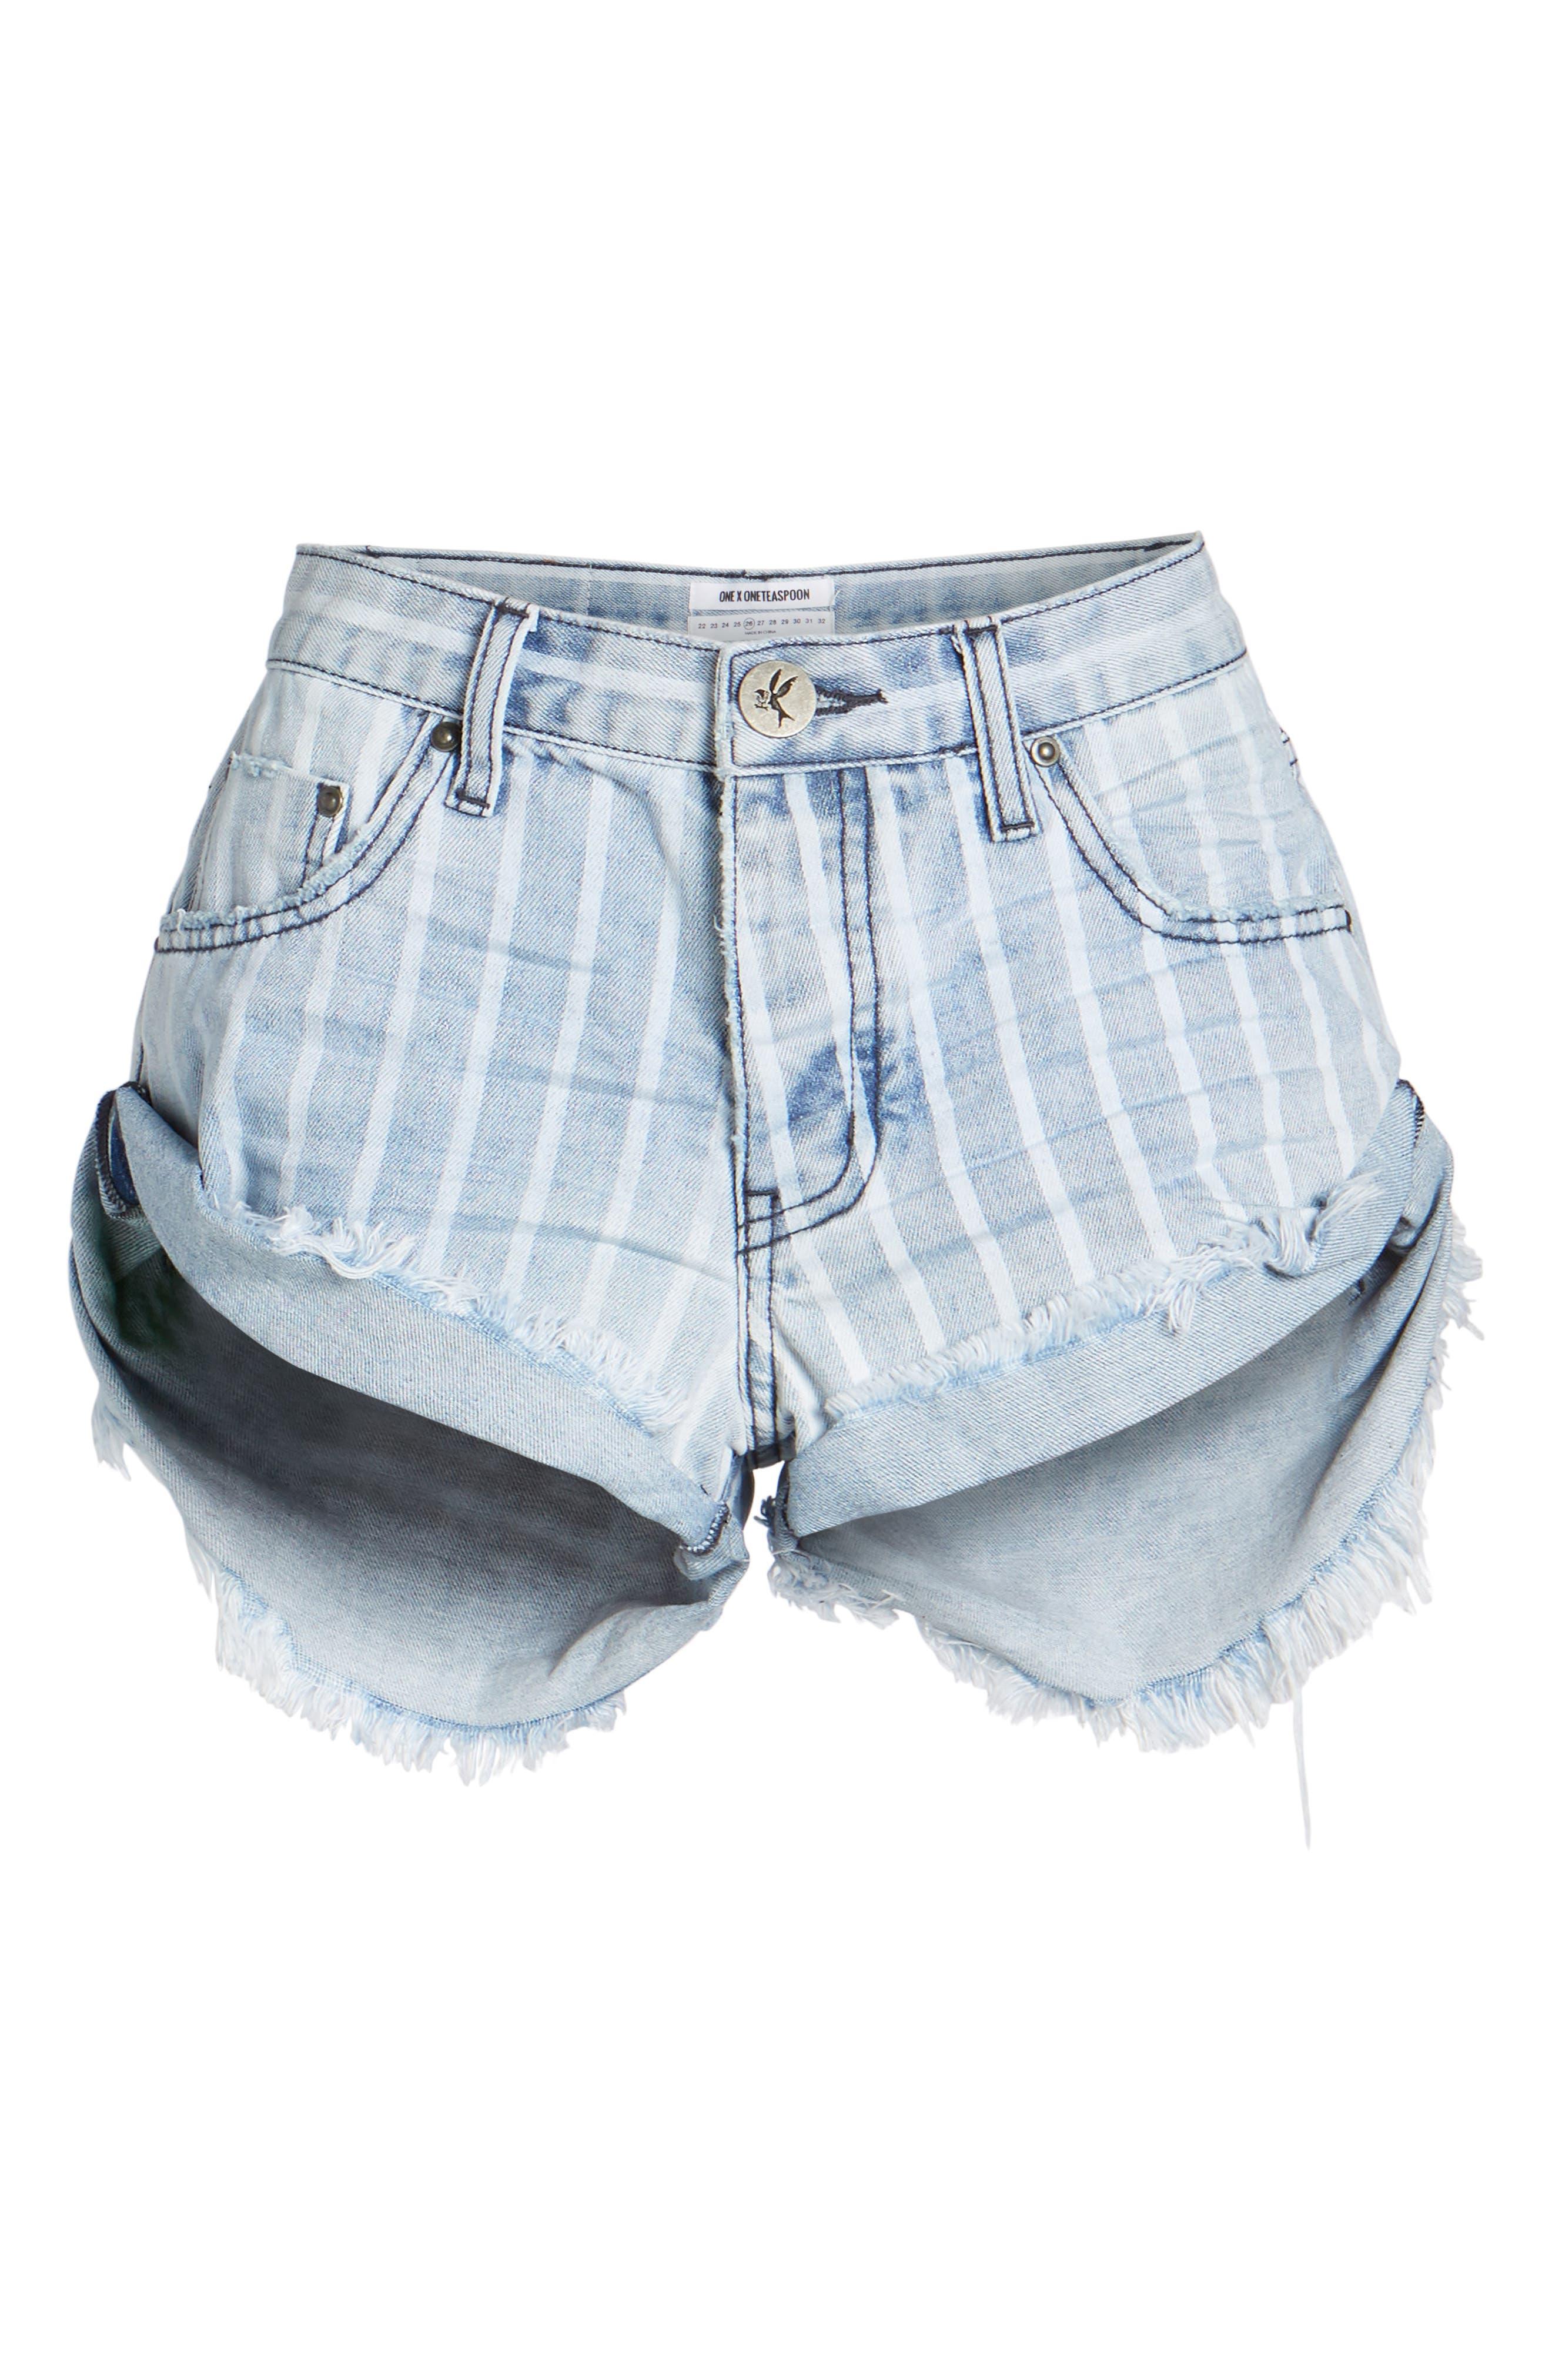 Bandit Stripe Denim Shorts,                             Alternate thumbnail 7, color,                             400